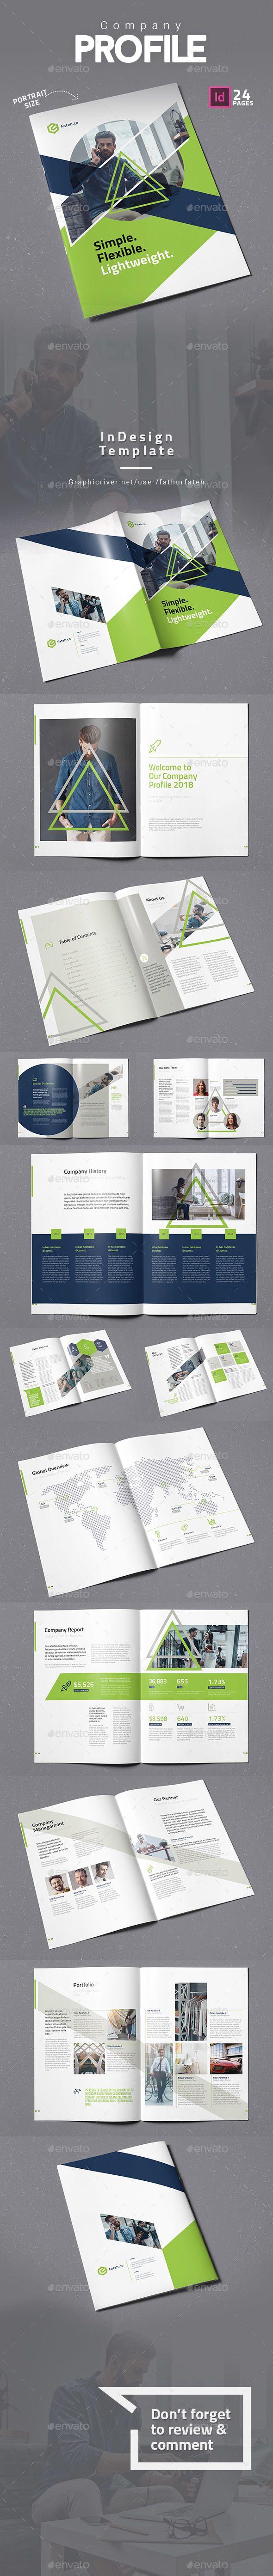 Company Profile Company Profile Brochures And Corporate Brochure - Company profile brochure template